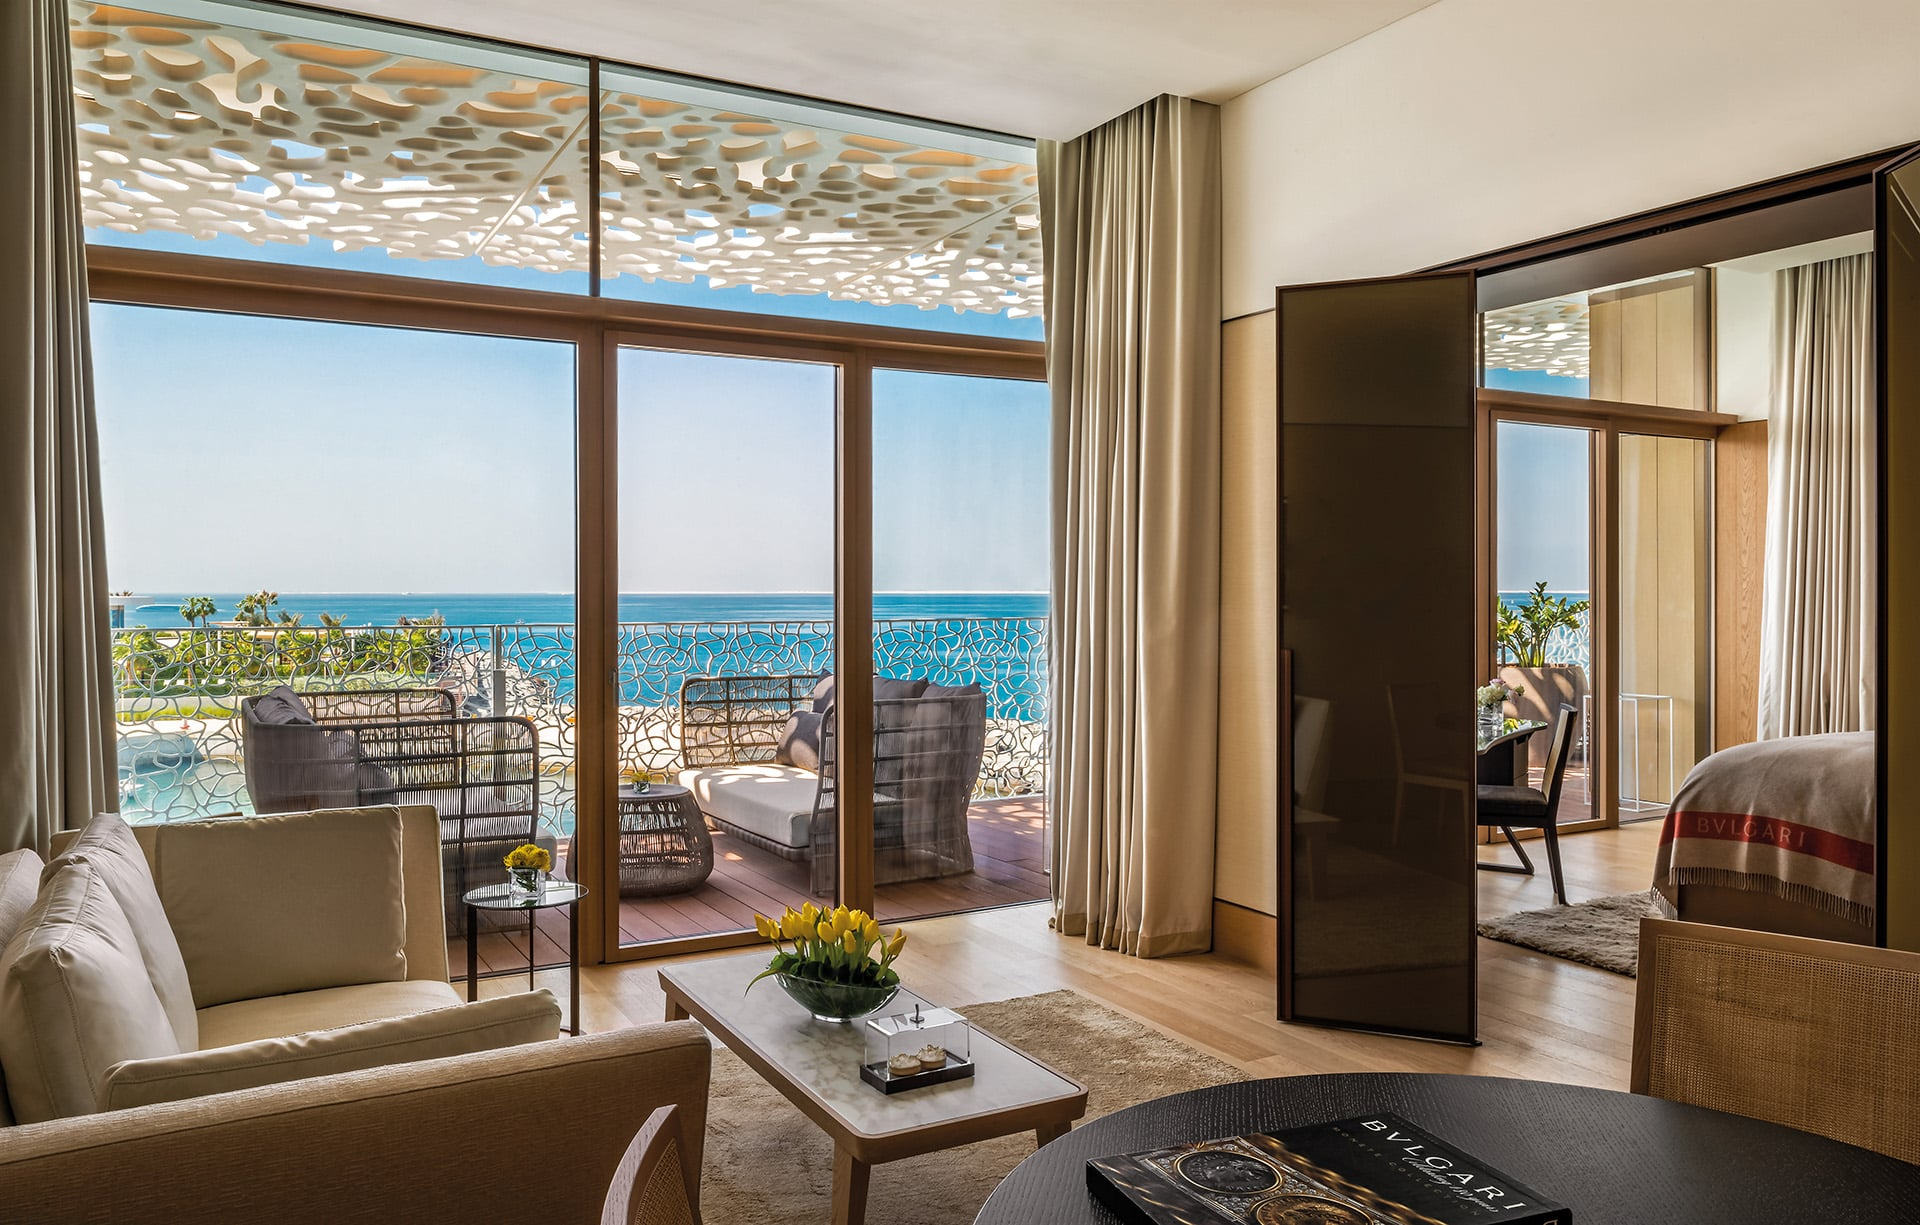 Bulgari Residences Apartments Villas for sale in Dubai Meraas Bvlgary 18